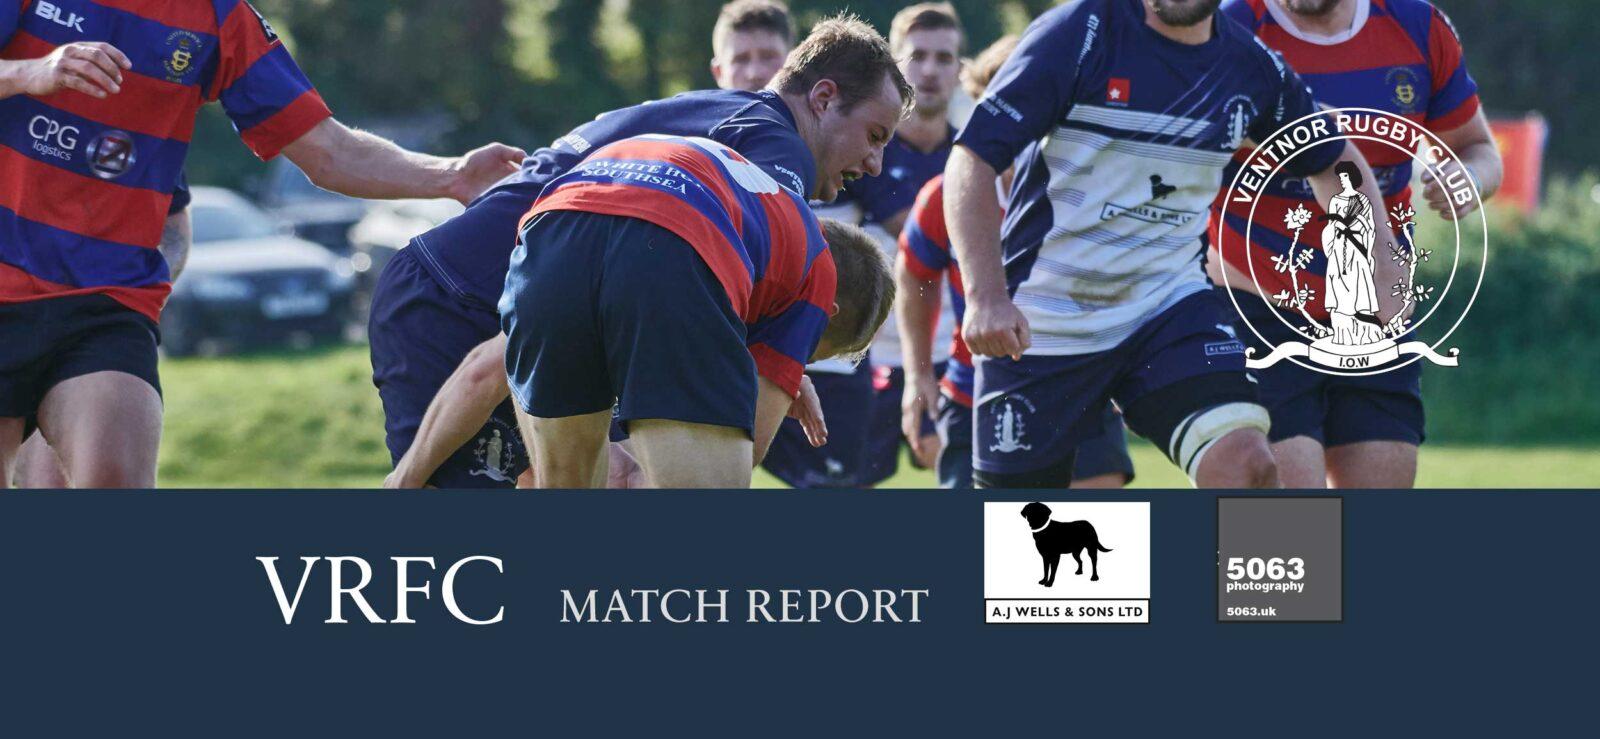 Match-report-Ventnor-RFC-1st-XV-v-United-Services-Portsmouth-23092017-slider-a